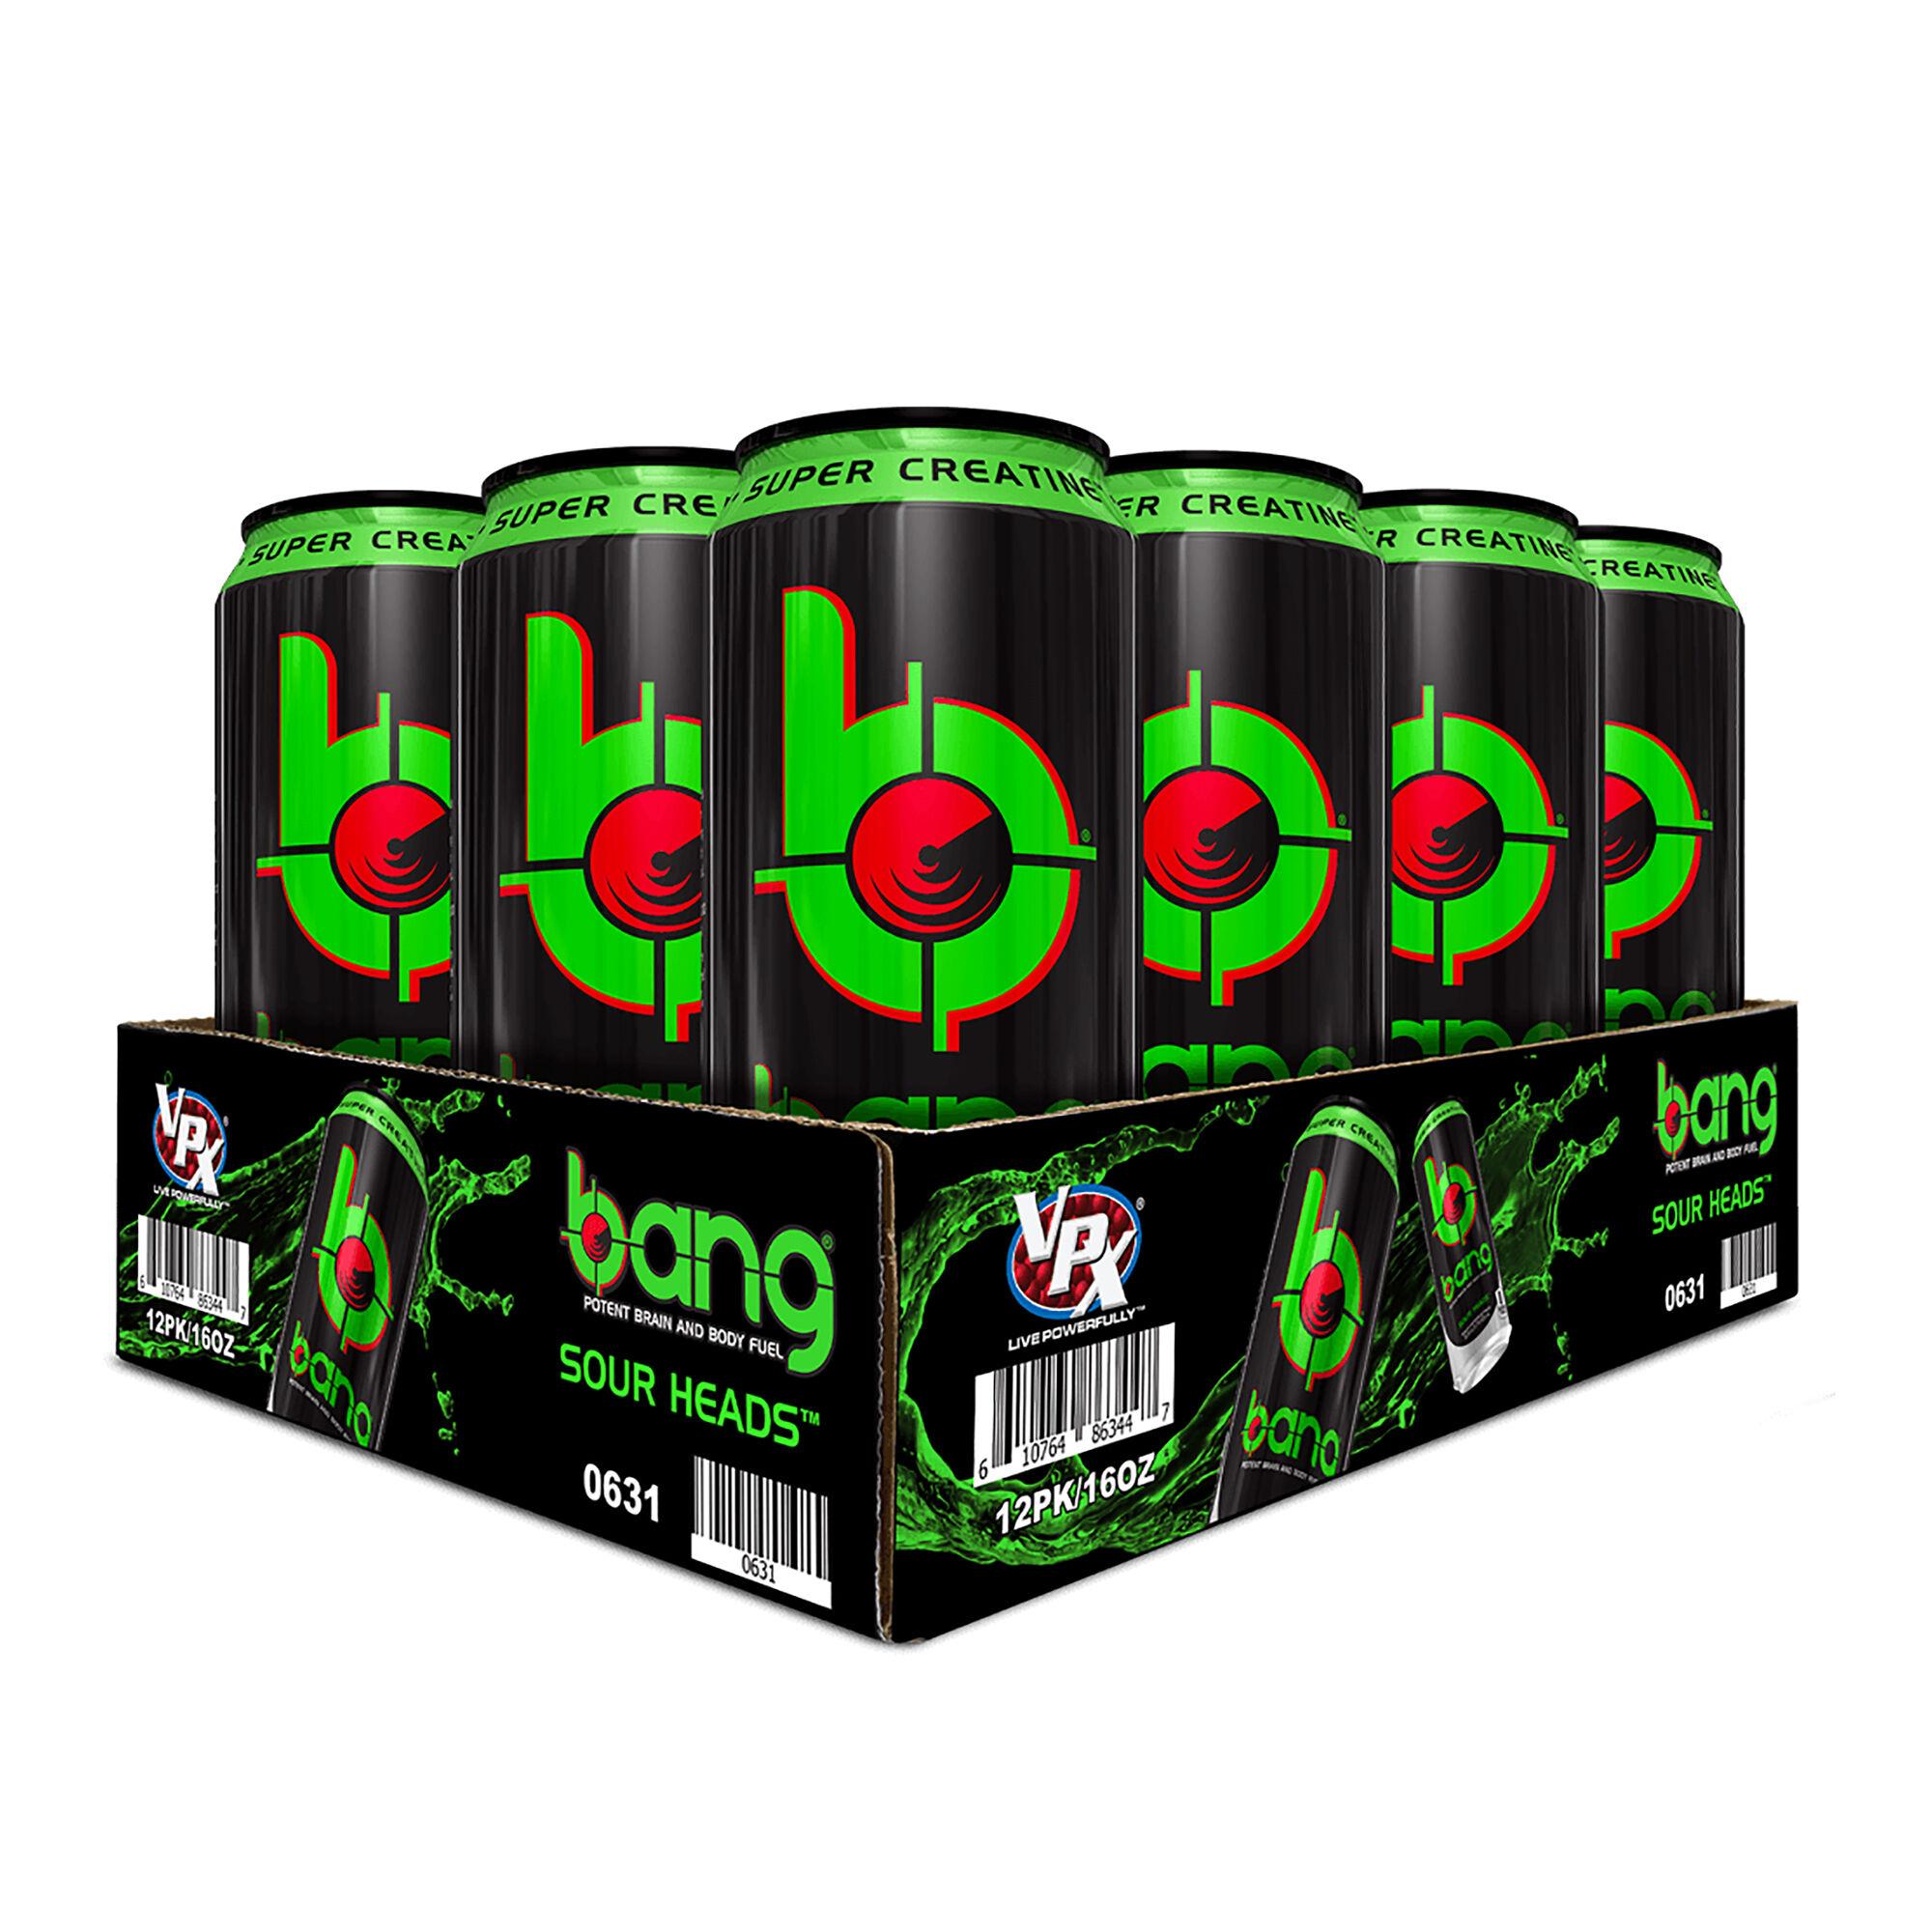 BANG BOGO 50% Off + $40 GNC Cash with $100 Spent ($1.21 per can w/ GNC Cash)